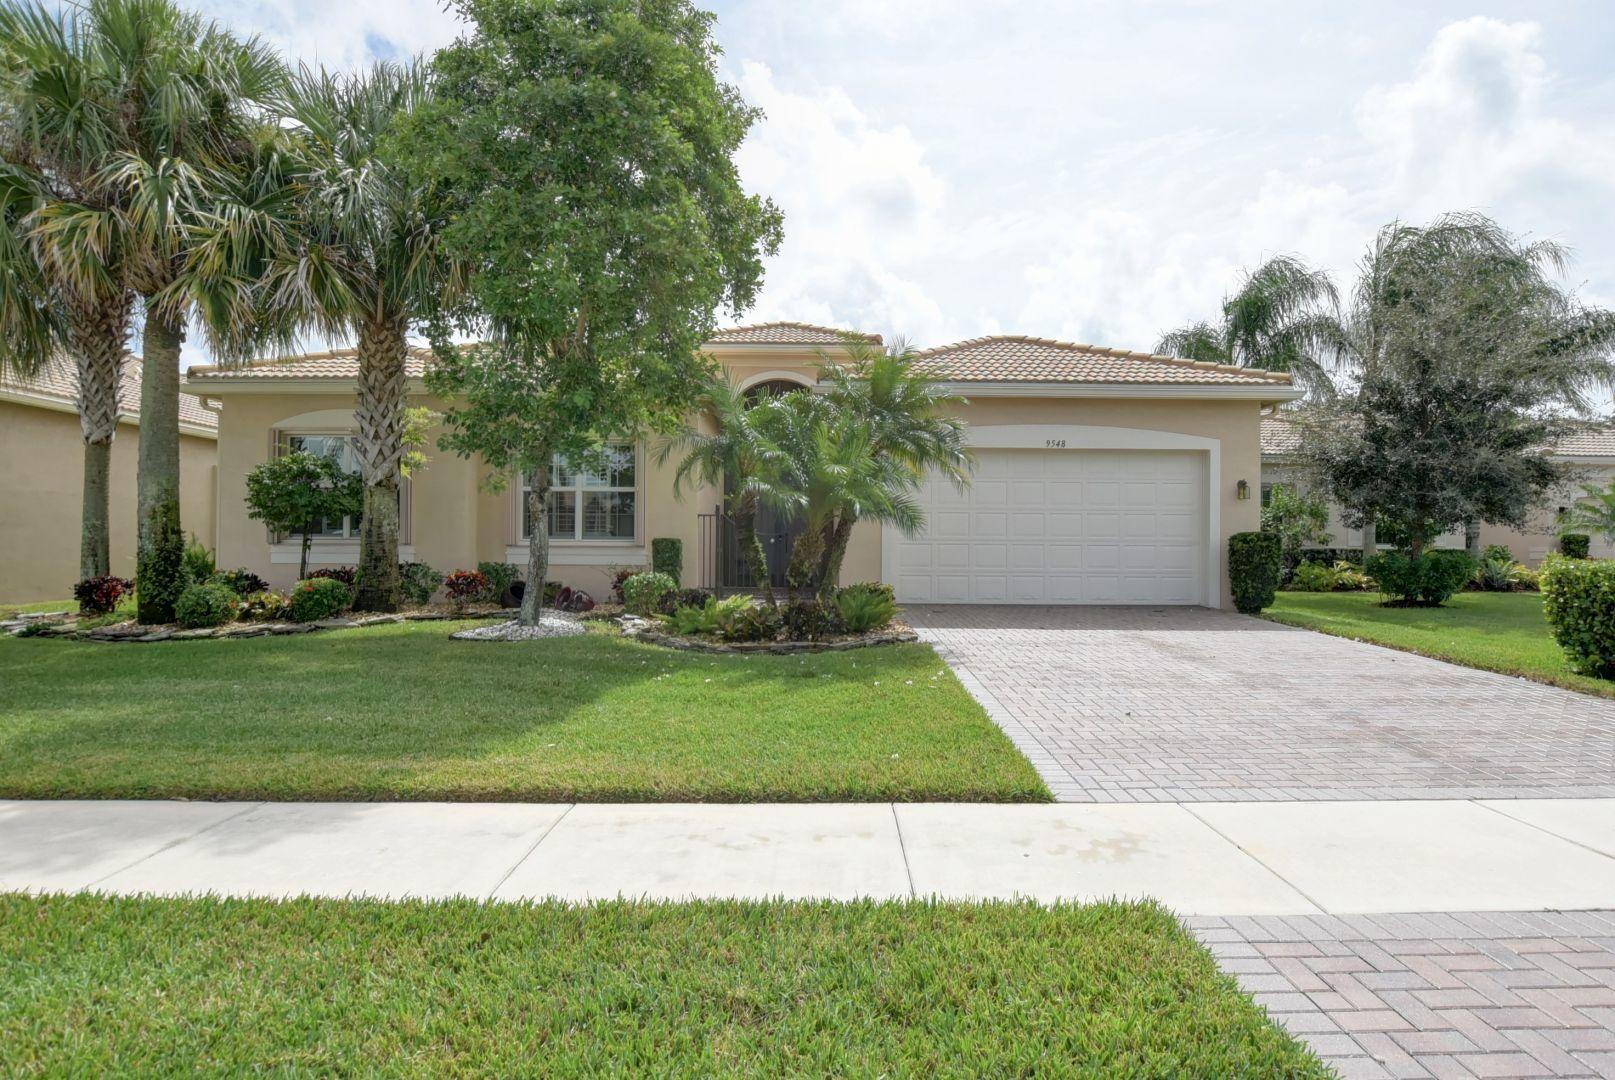 Valencia Reserve home 9548 Dovetree Isle Drive Boynton Beach FL 33473